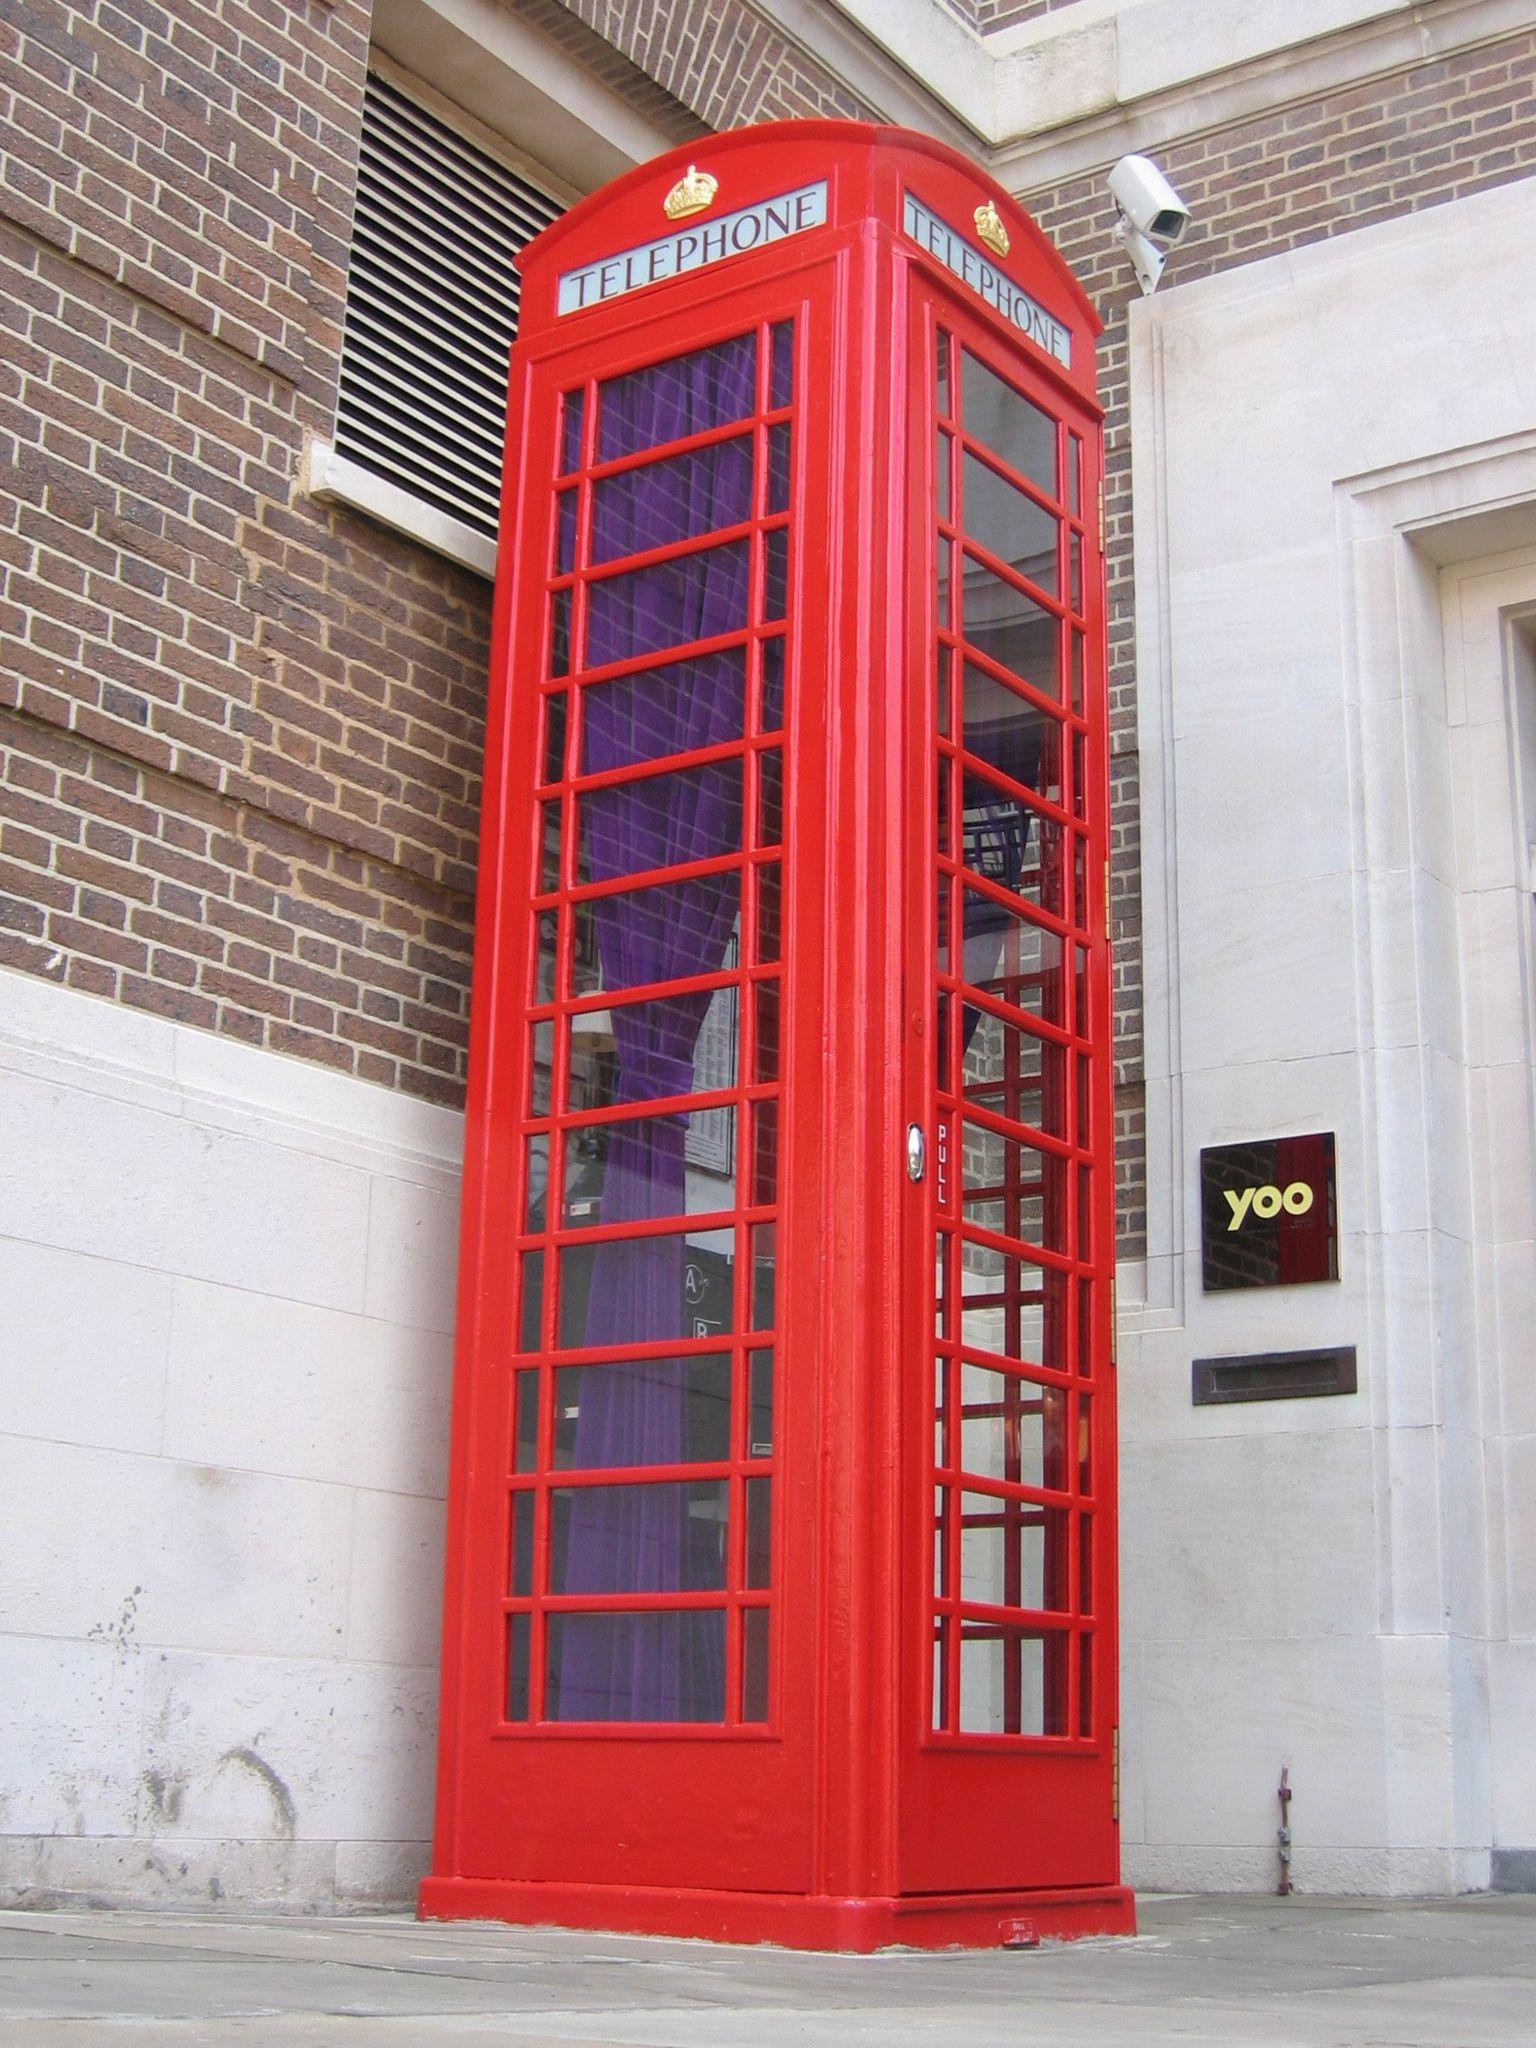 Double decker phone box